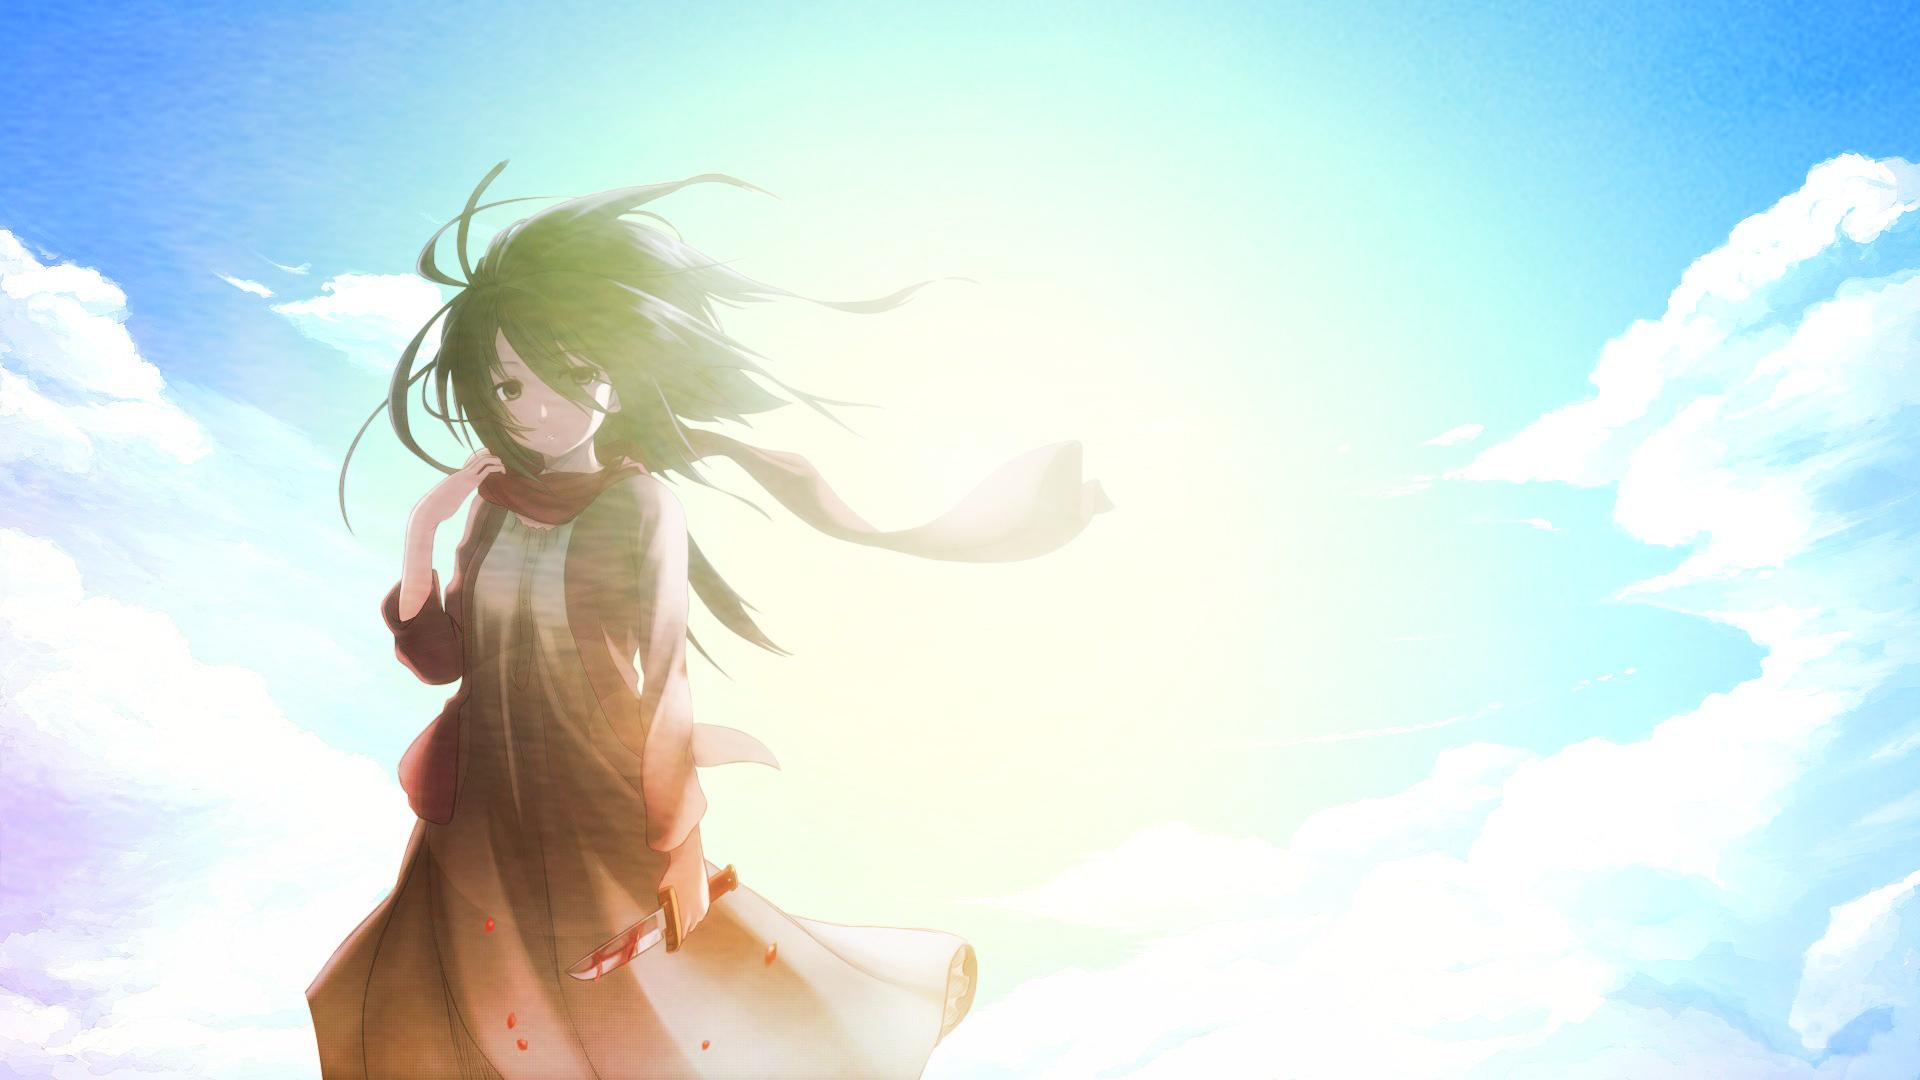 Wallpaper Sunlight Anime Sky Shingeki No Kyojin Misaka